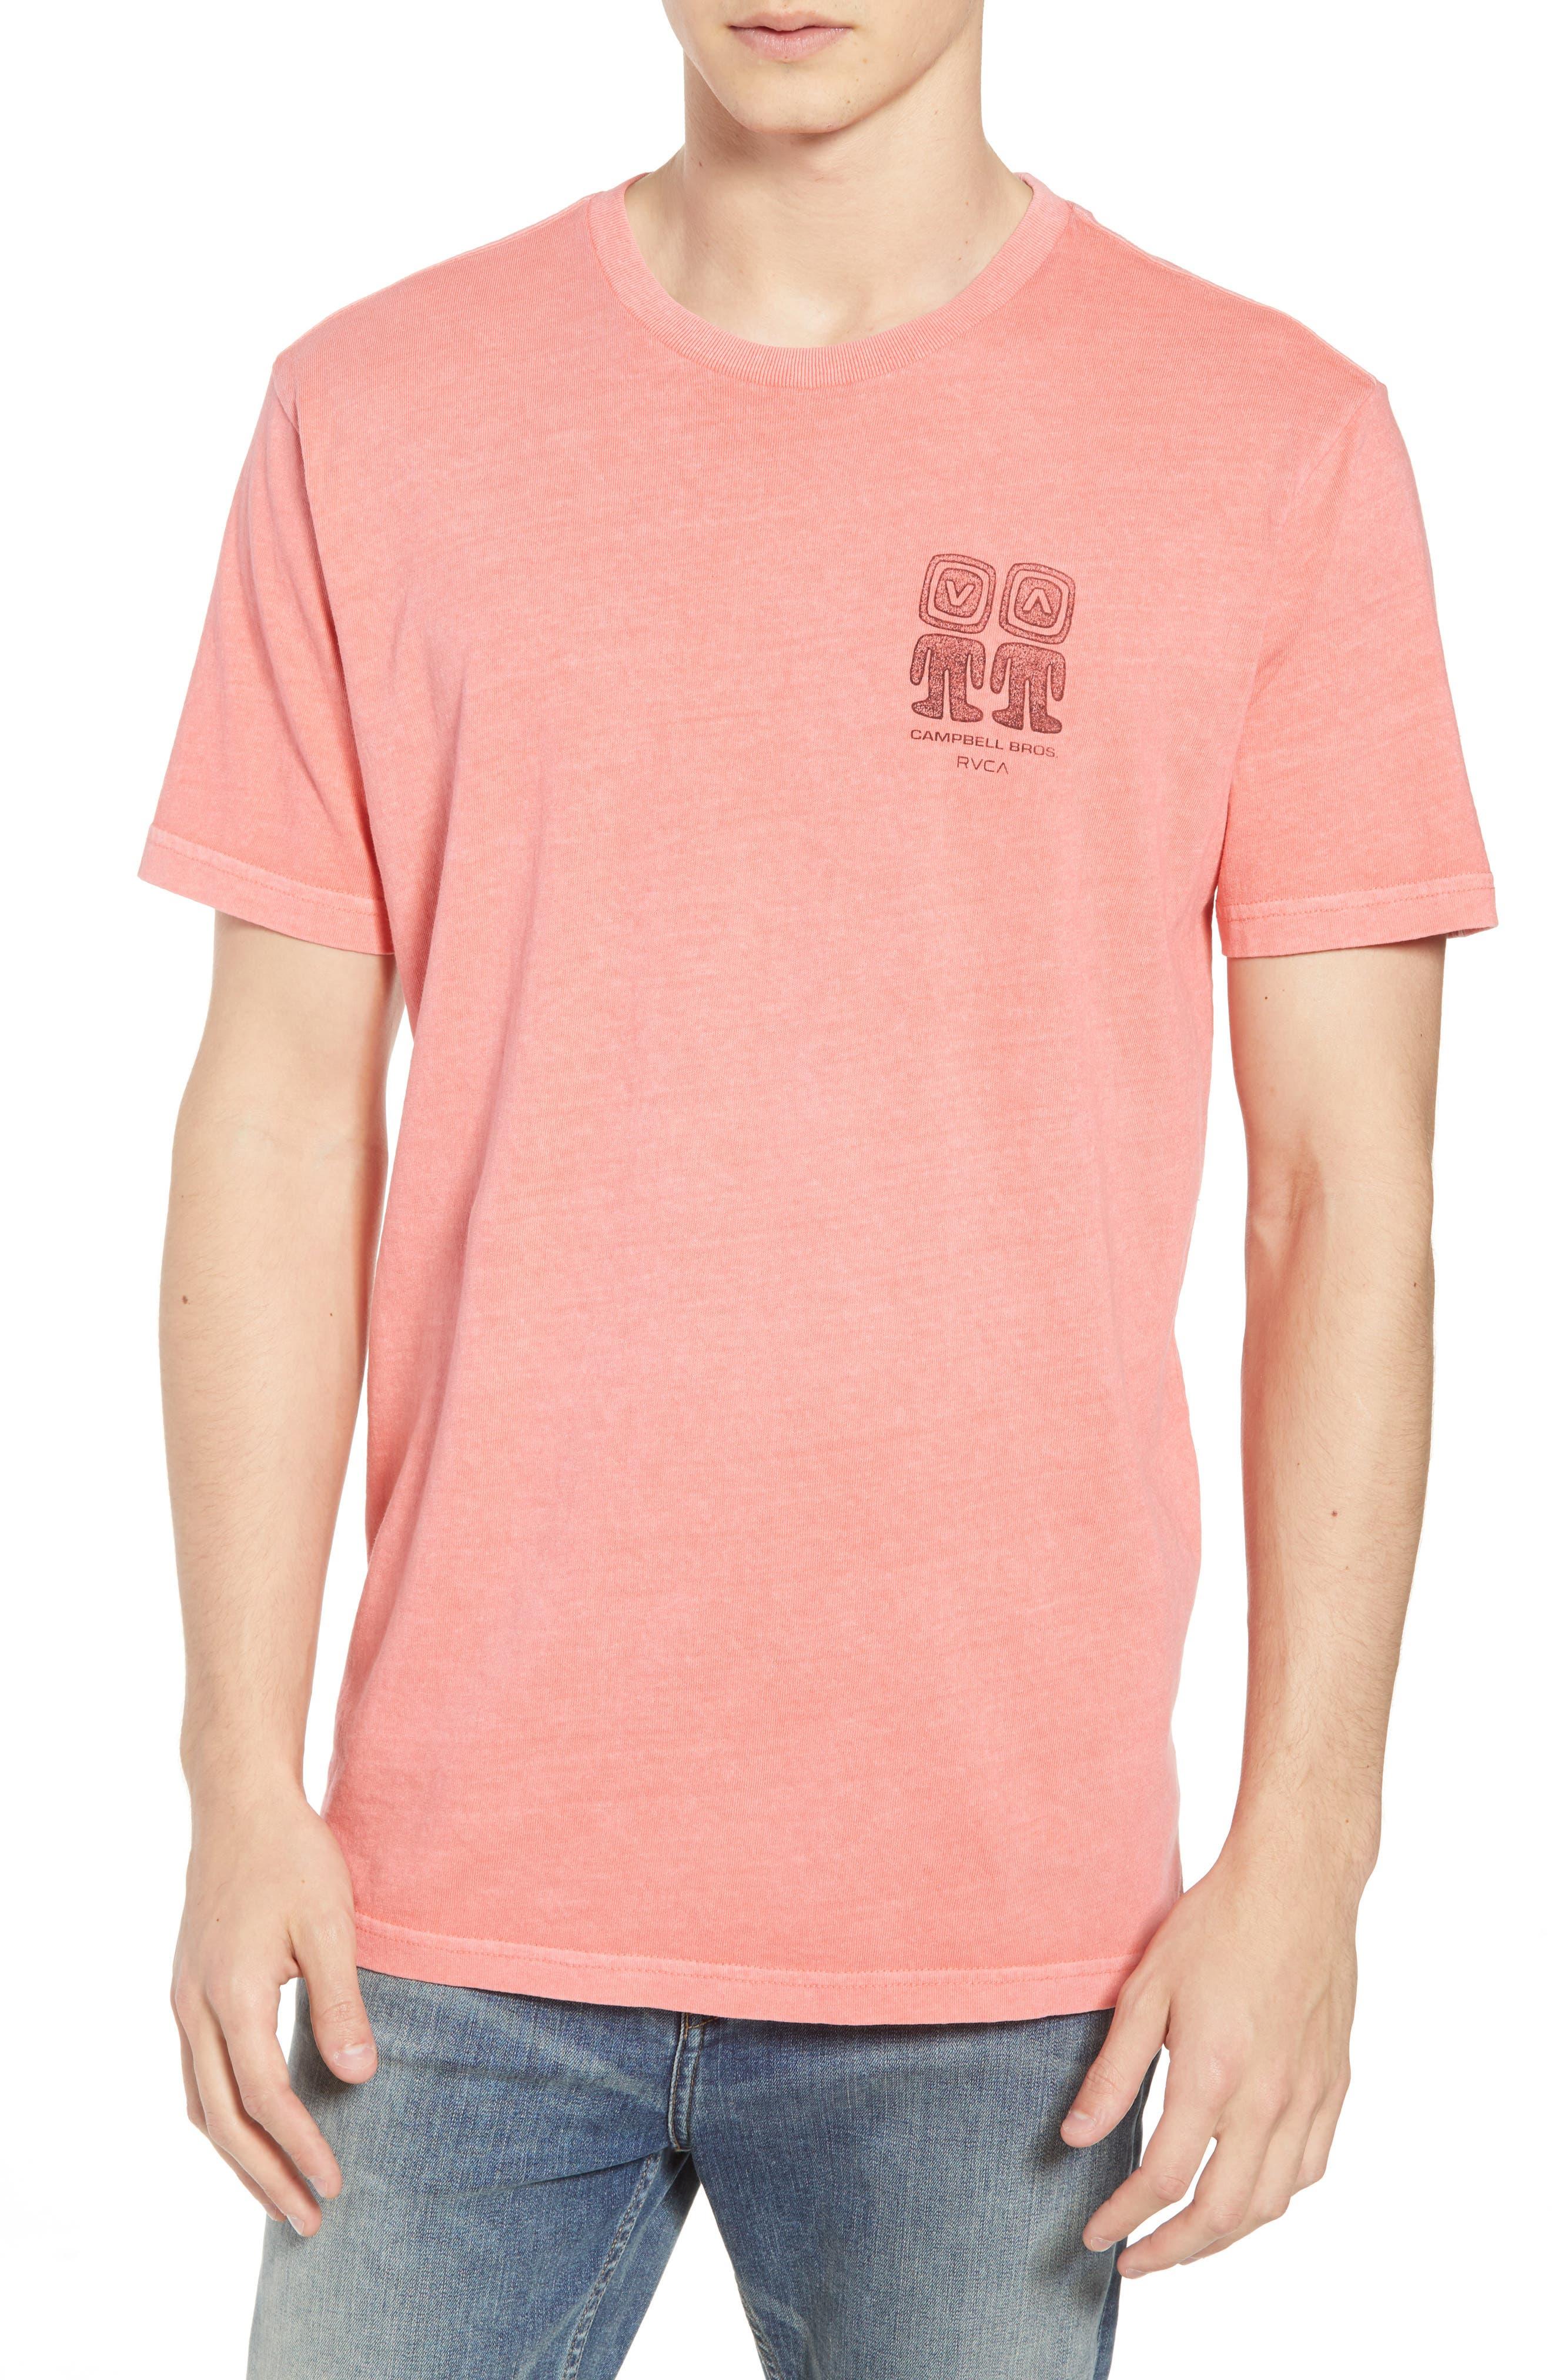 Campbell Brothers T-Shirt,                             Main thumbnail 1, color,                             PINK